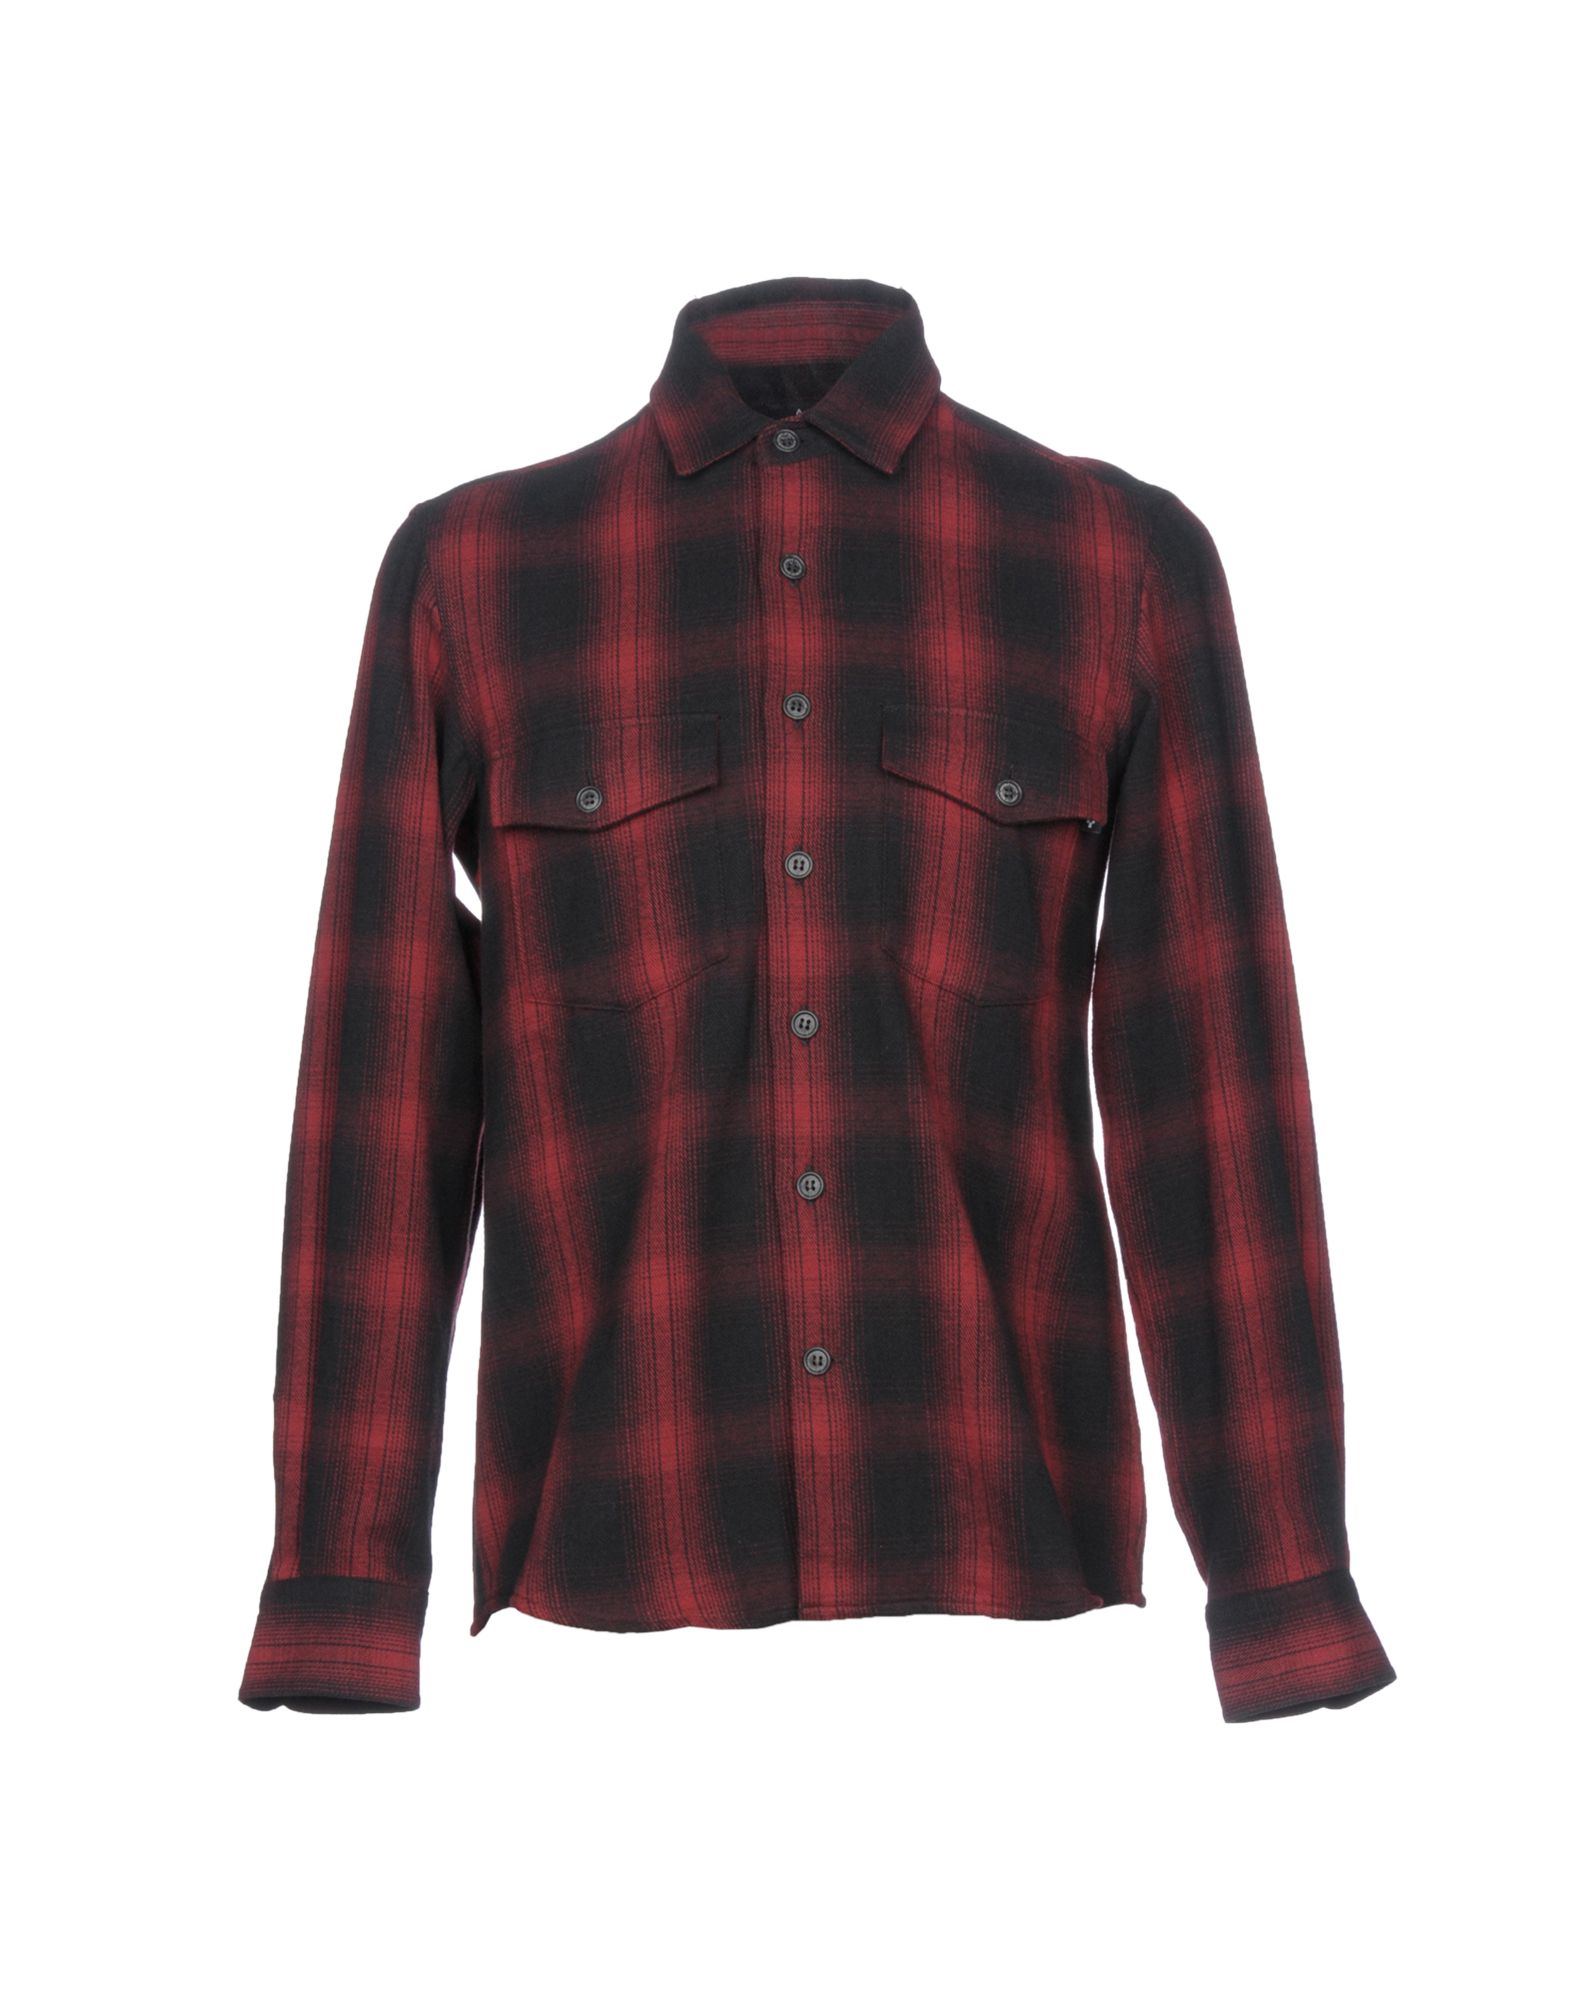 94398e8dbfd5 Buy marcelo burlon shirts for men - Best men's marcelo burlon shirts shop -  Cools.com